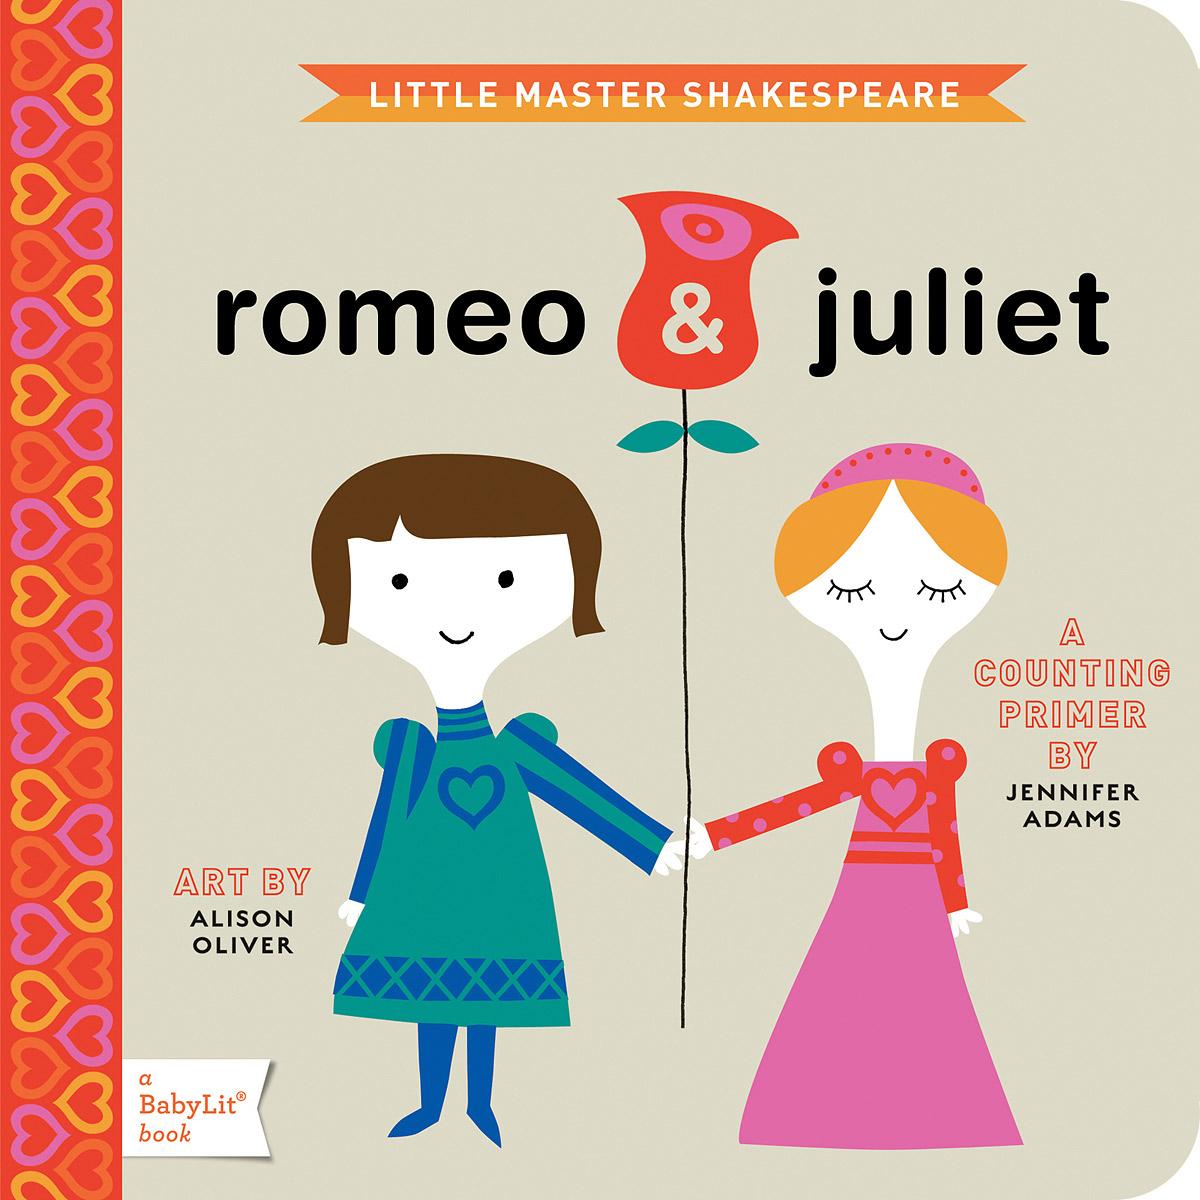 Little Master Shakespeare: Romeo & Juliet shakespeare william rdr cd [lv 2] romeo and juliet